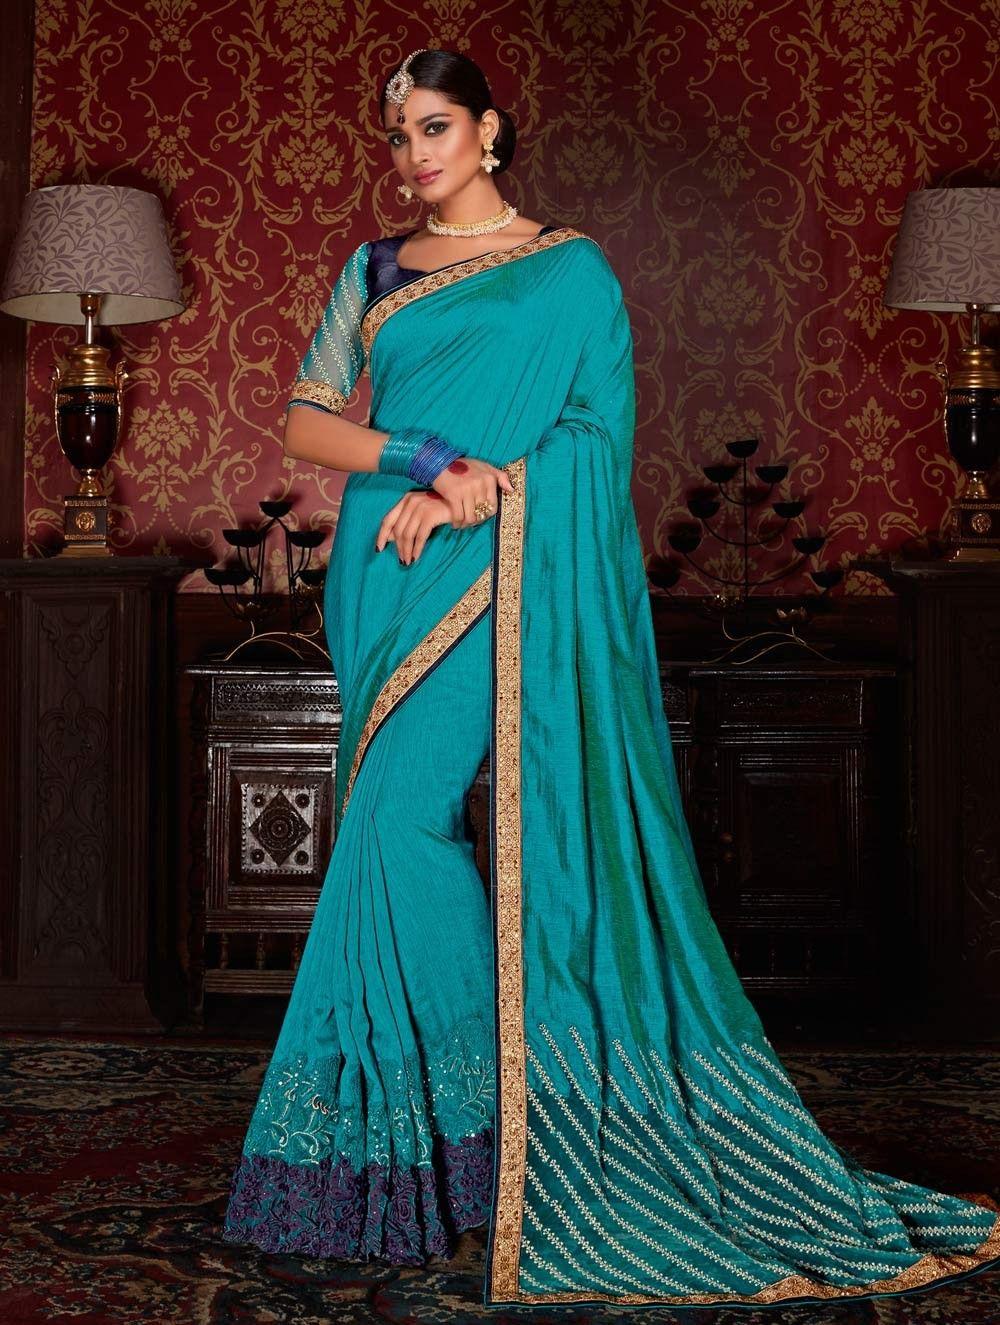 Tiffany Blue & Red half and half designer Indian saree in banarasi ...